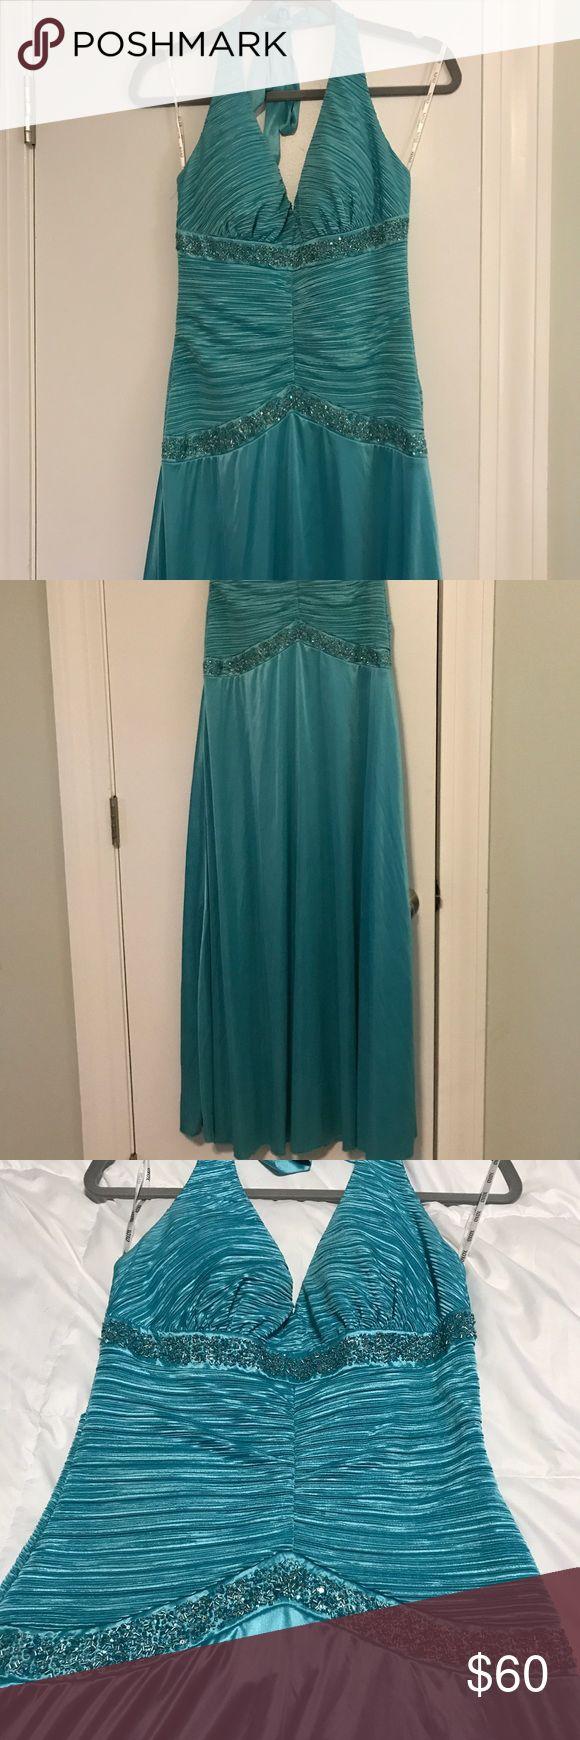 10 best My Posh Closet images on Pinterest | Black halter dresses ...